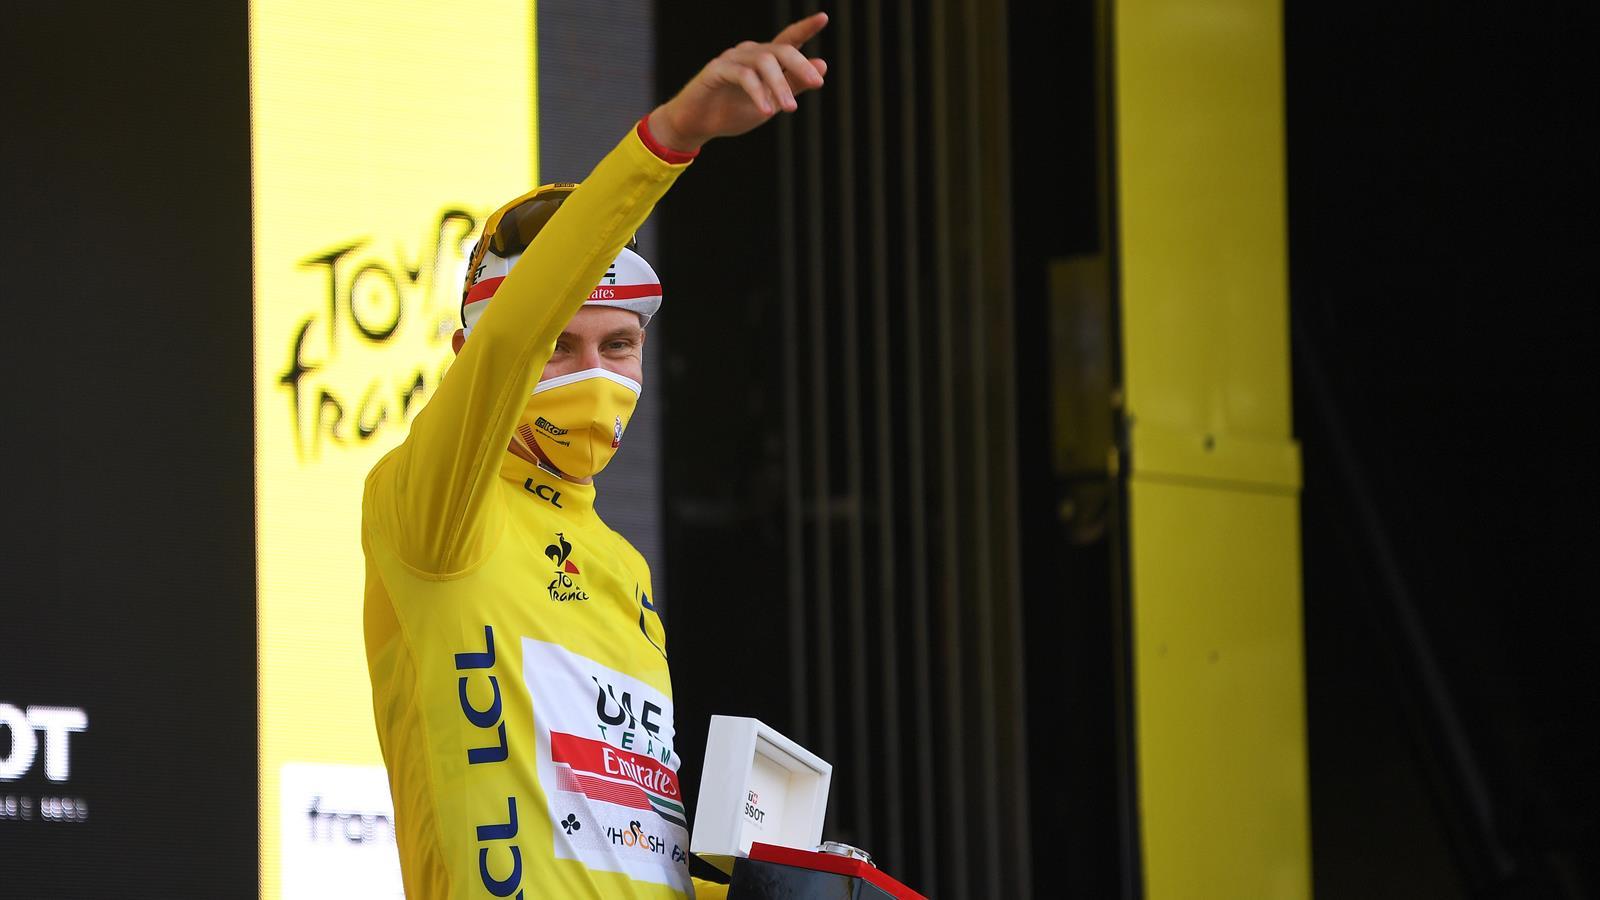 eurosport.co.uk - DanQuarrell - Phenomenal Tadej Pogacar has changed cycling at 2020 Tour de France' - Bradley Wiggins